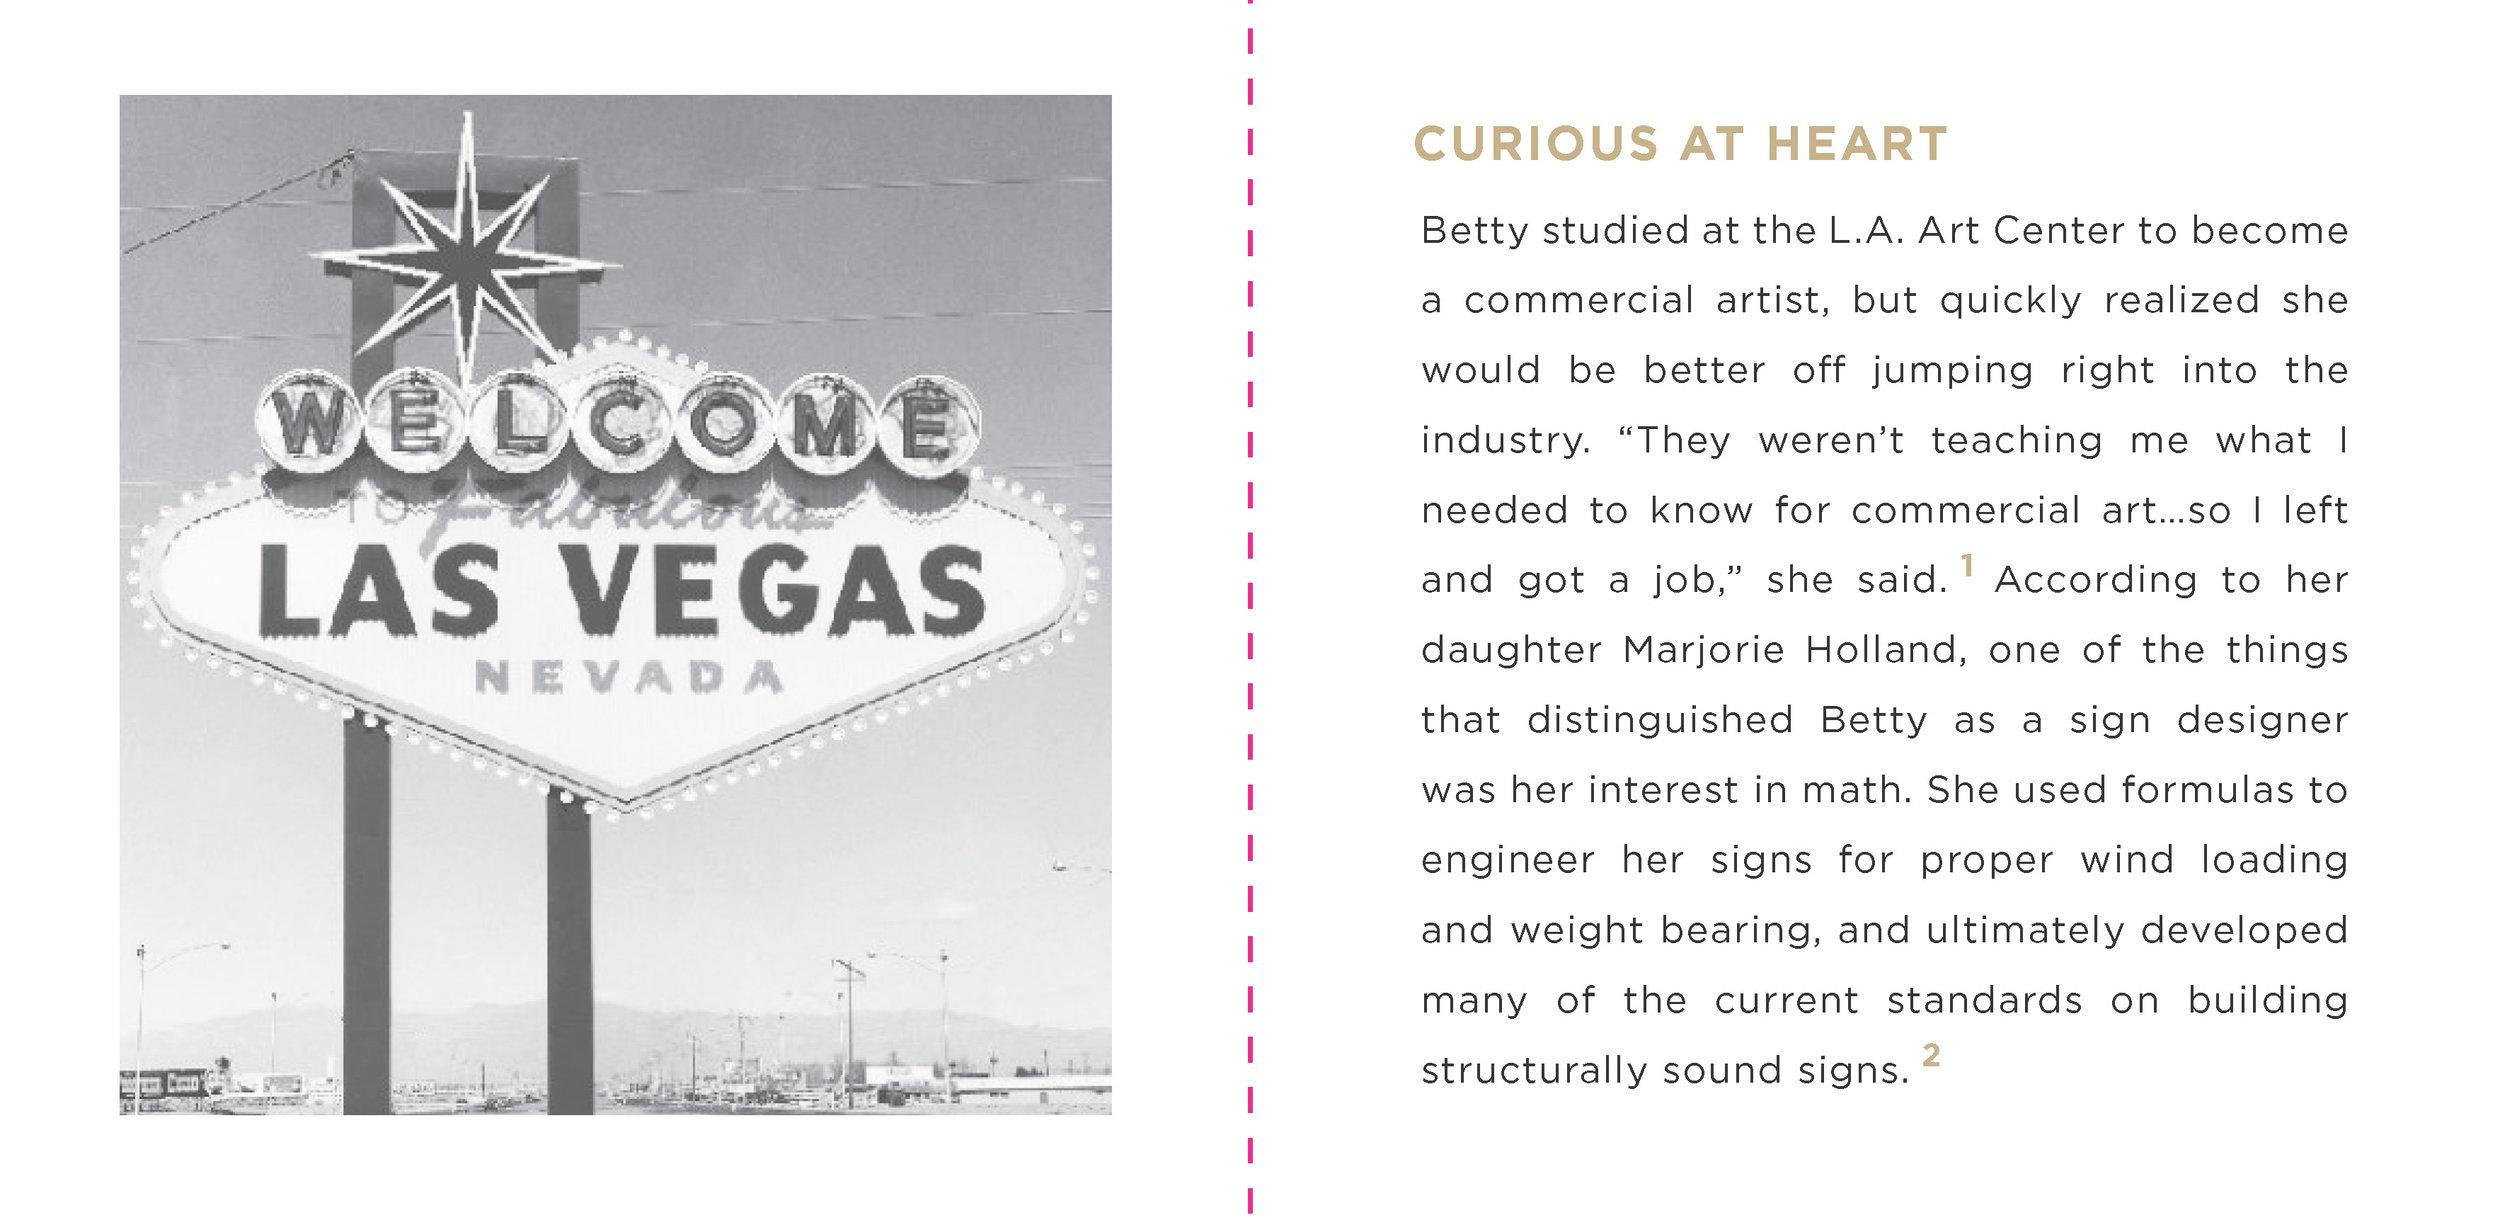 BettyWillis_Storybook_Update (1)_600_1d.jpg